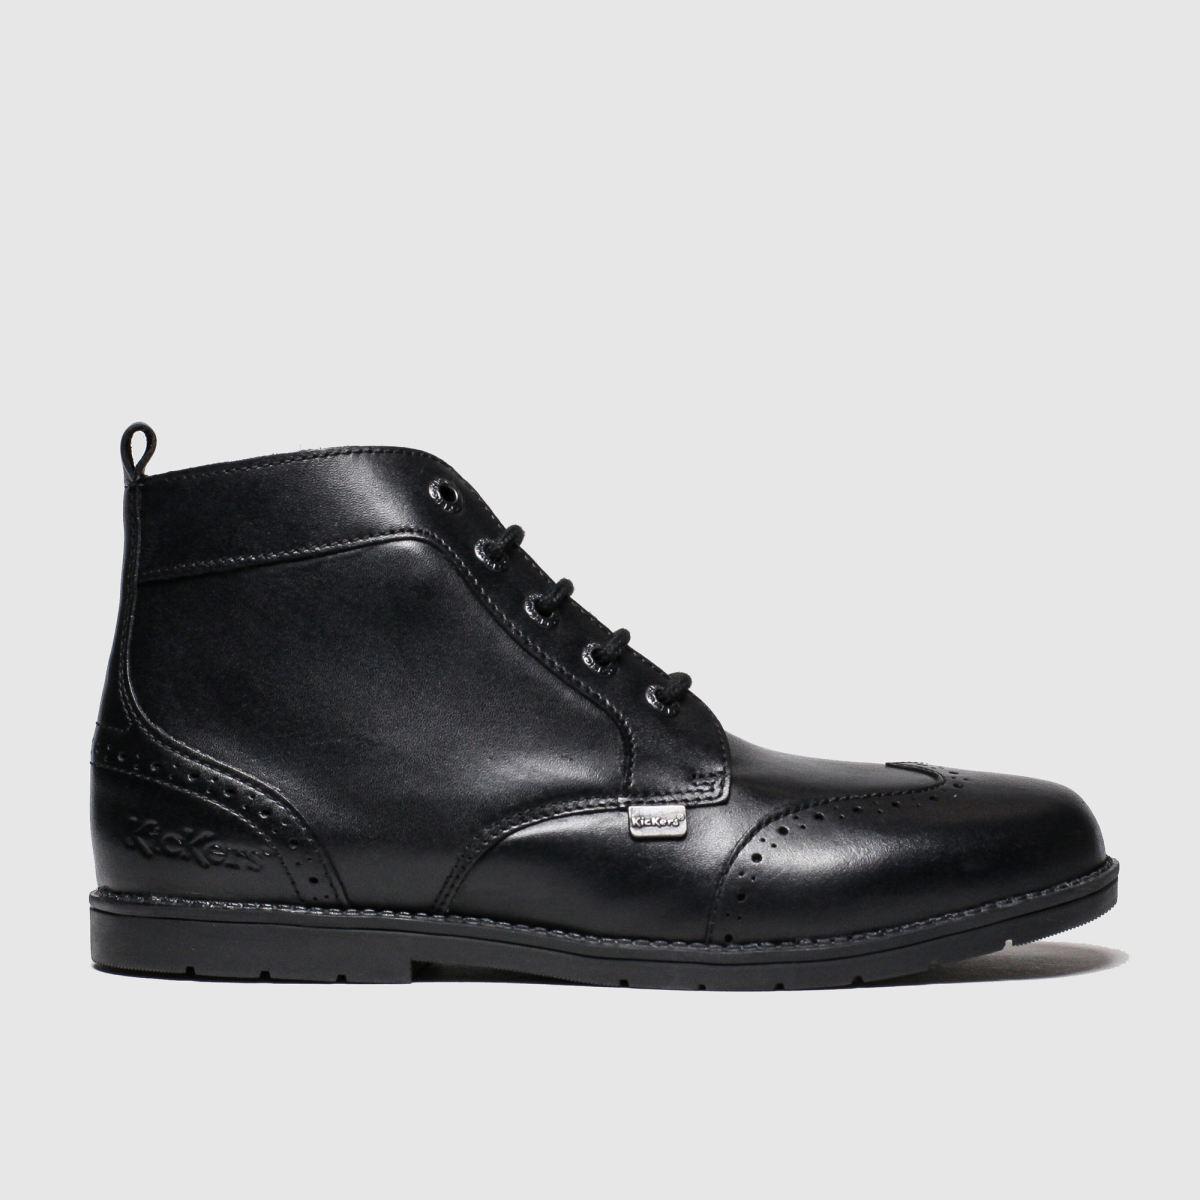 Kickers Black Orin Brogue Boots Youth